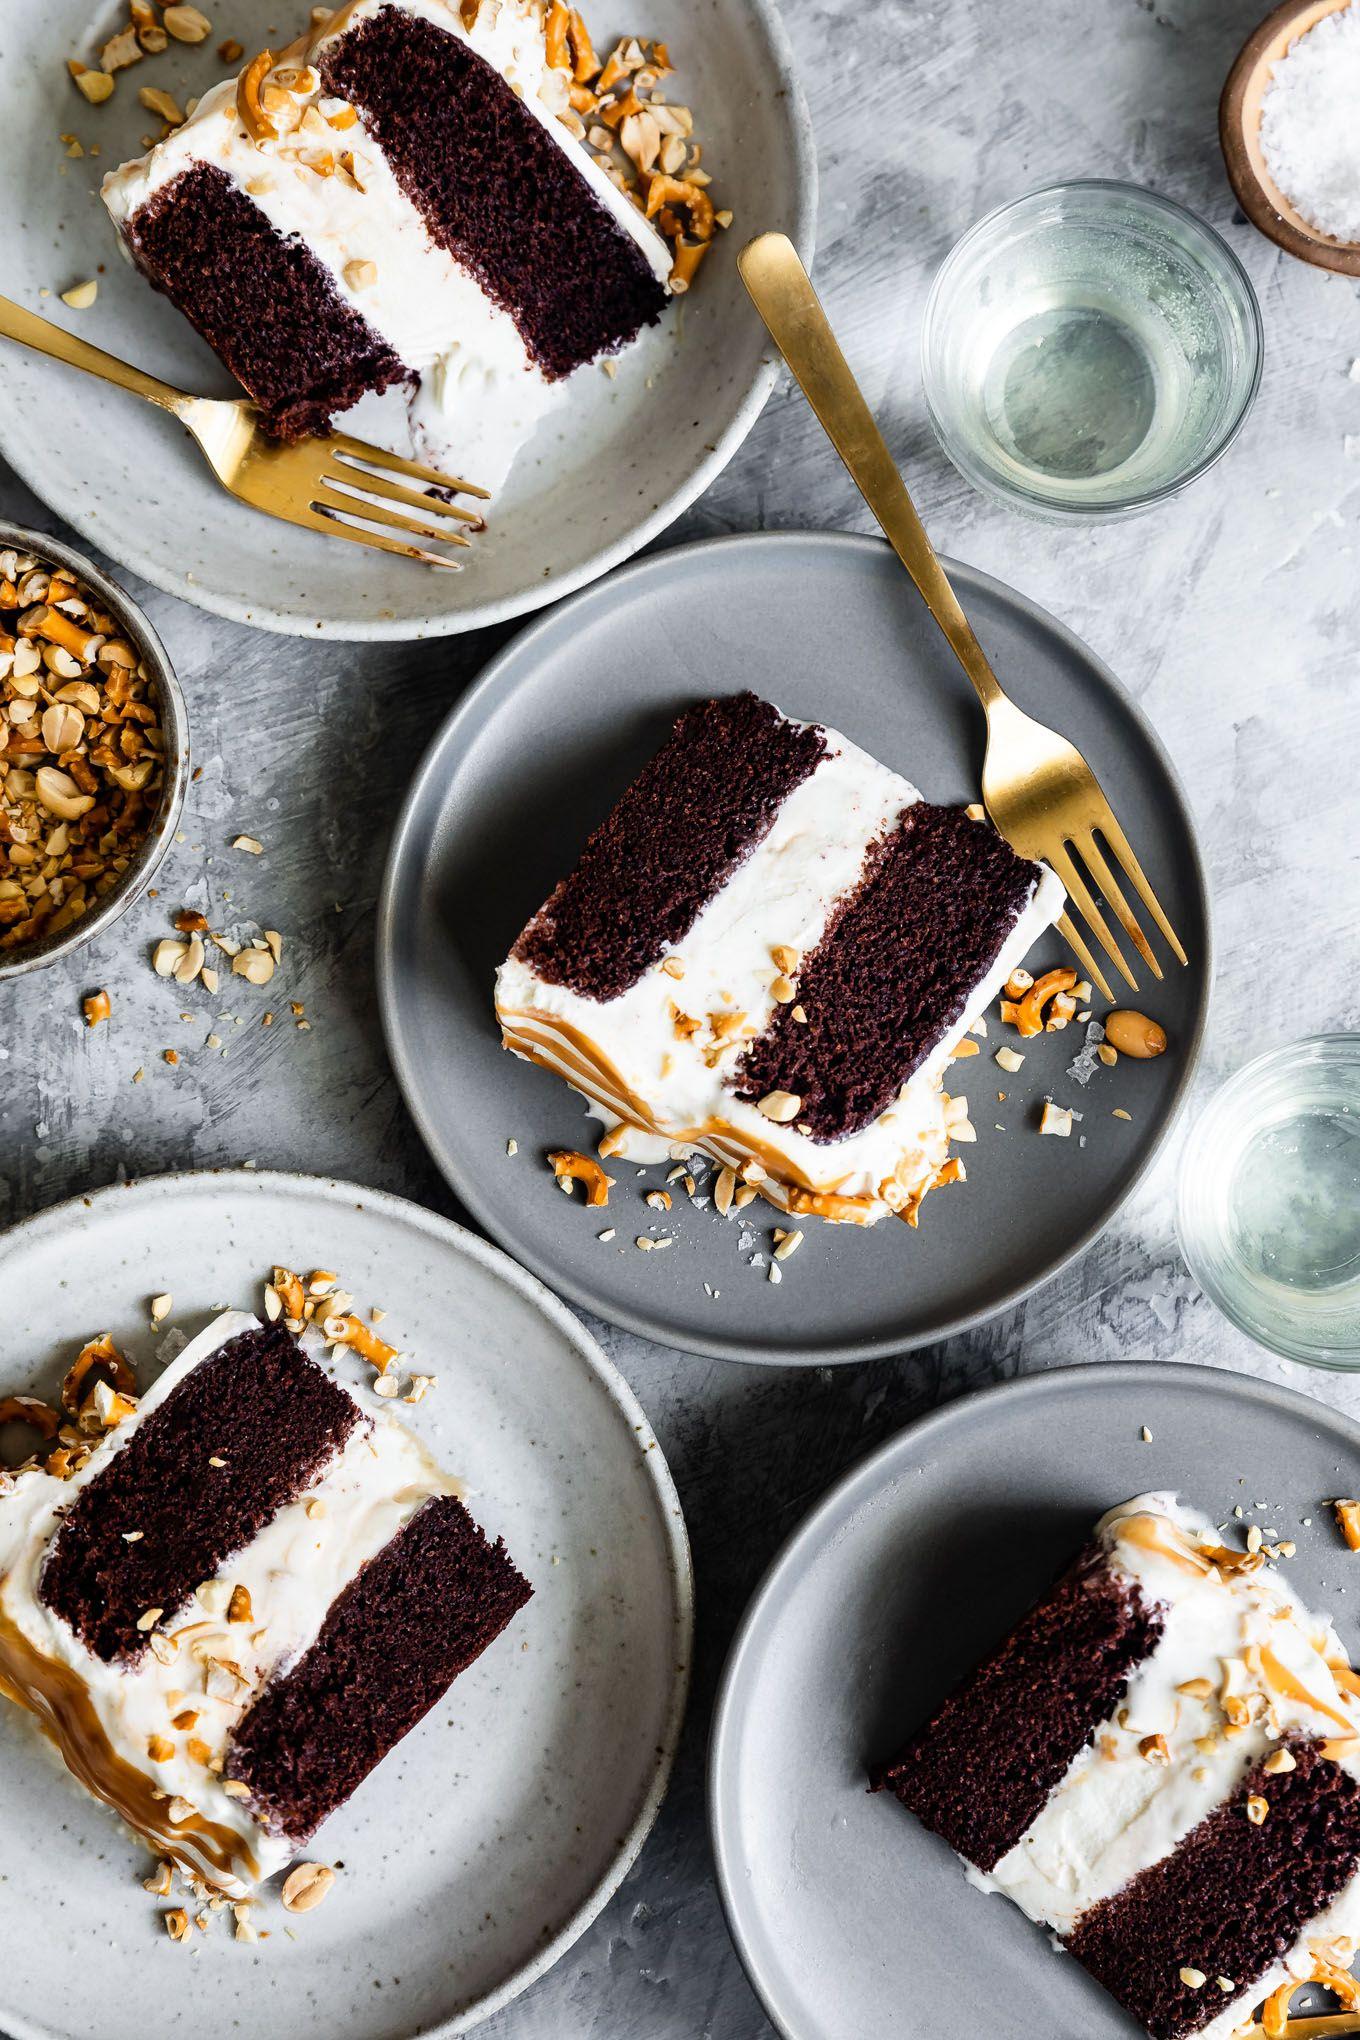 Chocolate glutenfree ice cream cake with caramel recipe